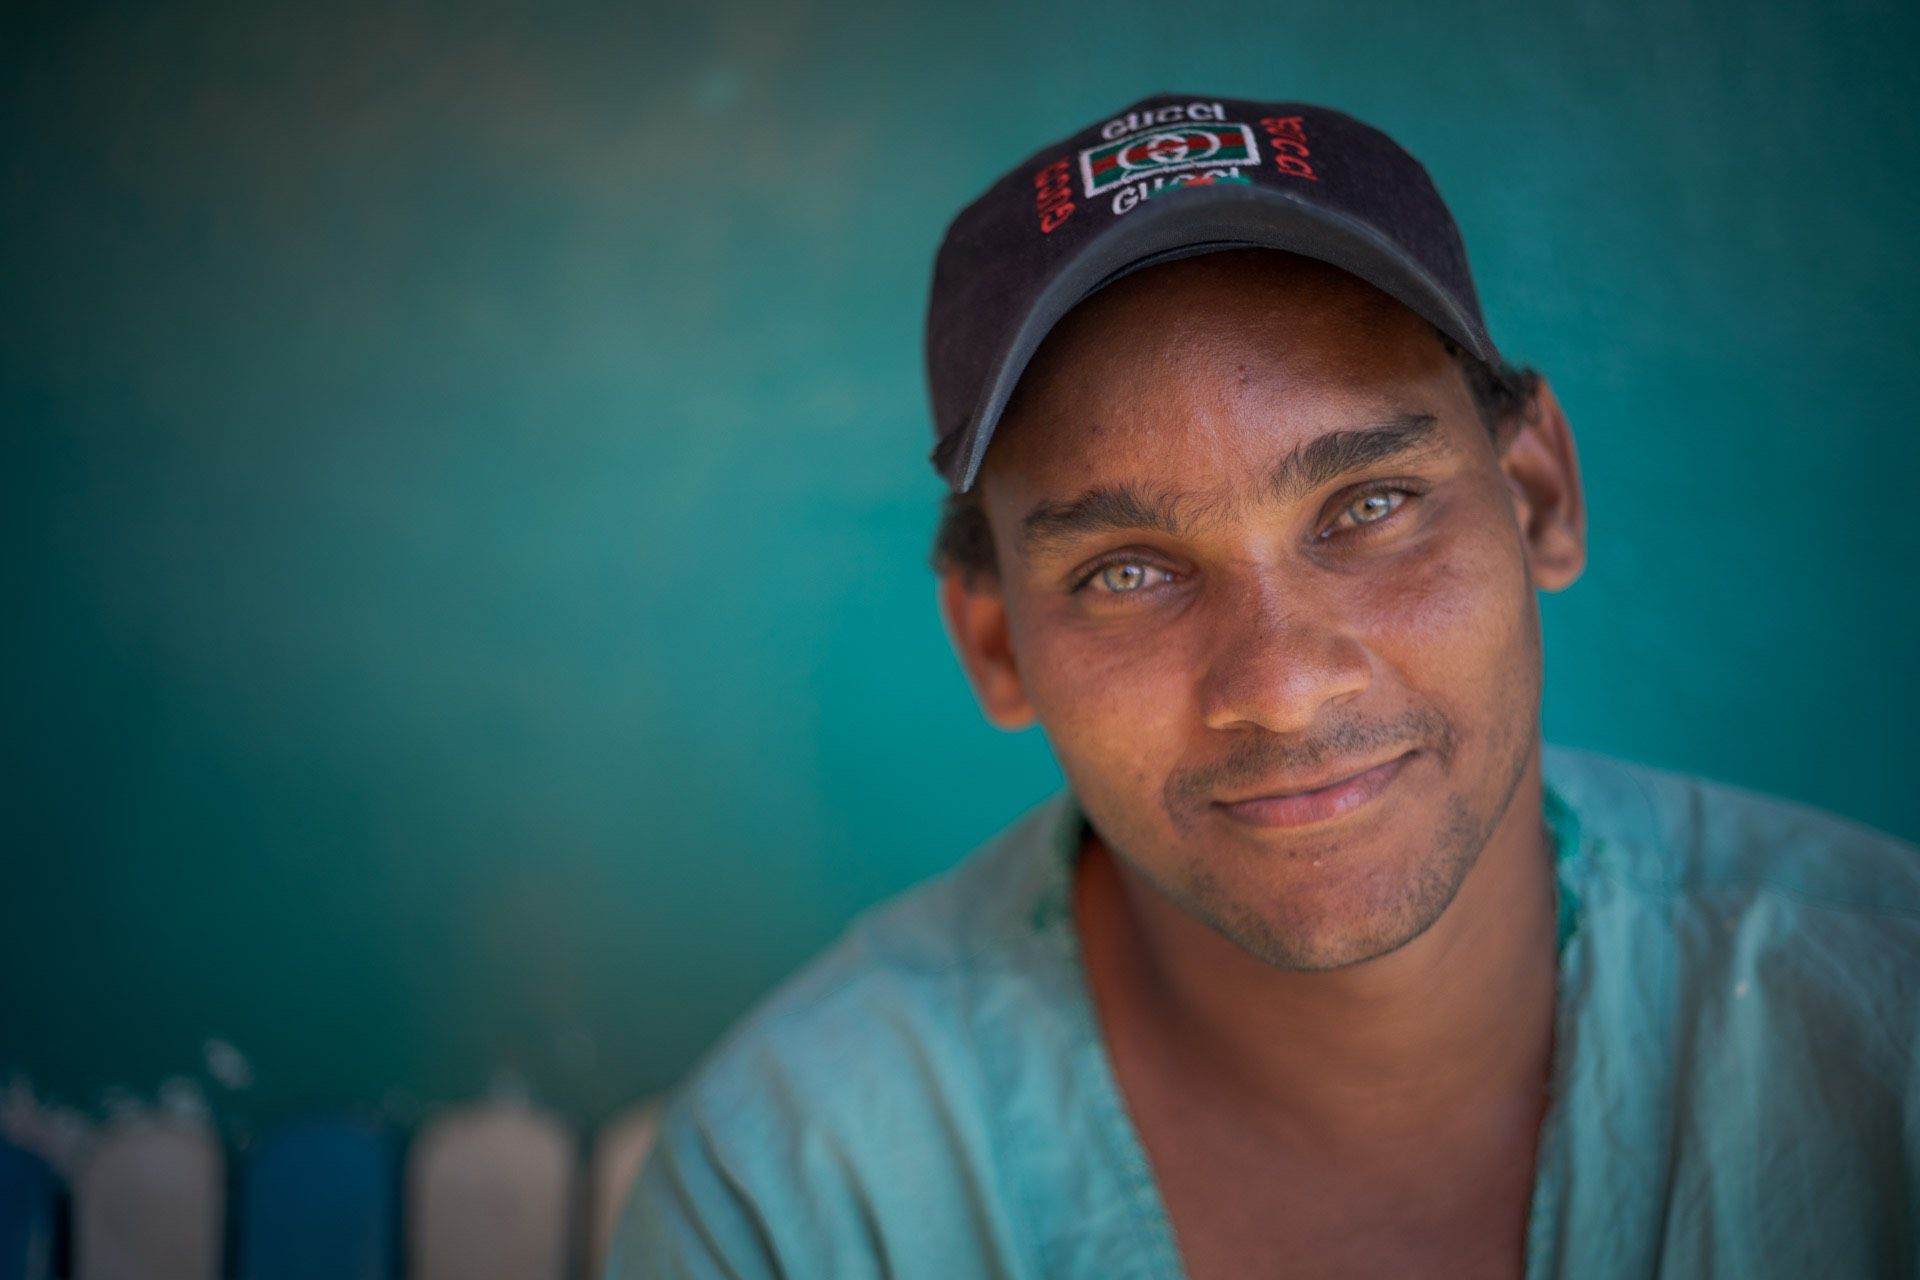 Green eyes taken on Cuba photo tour